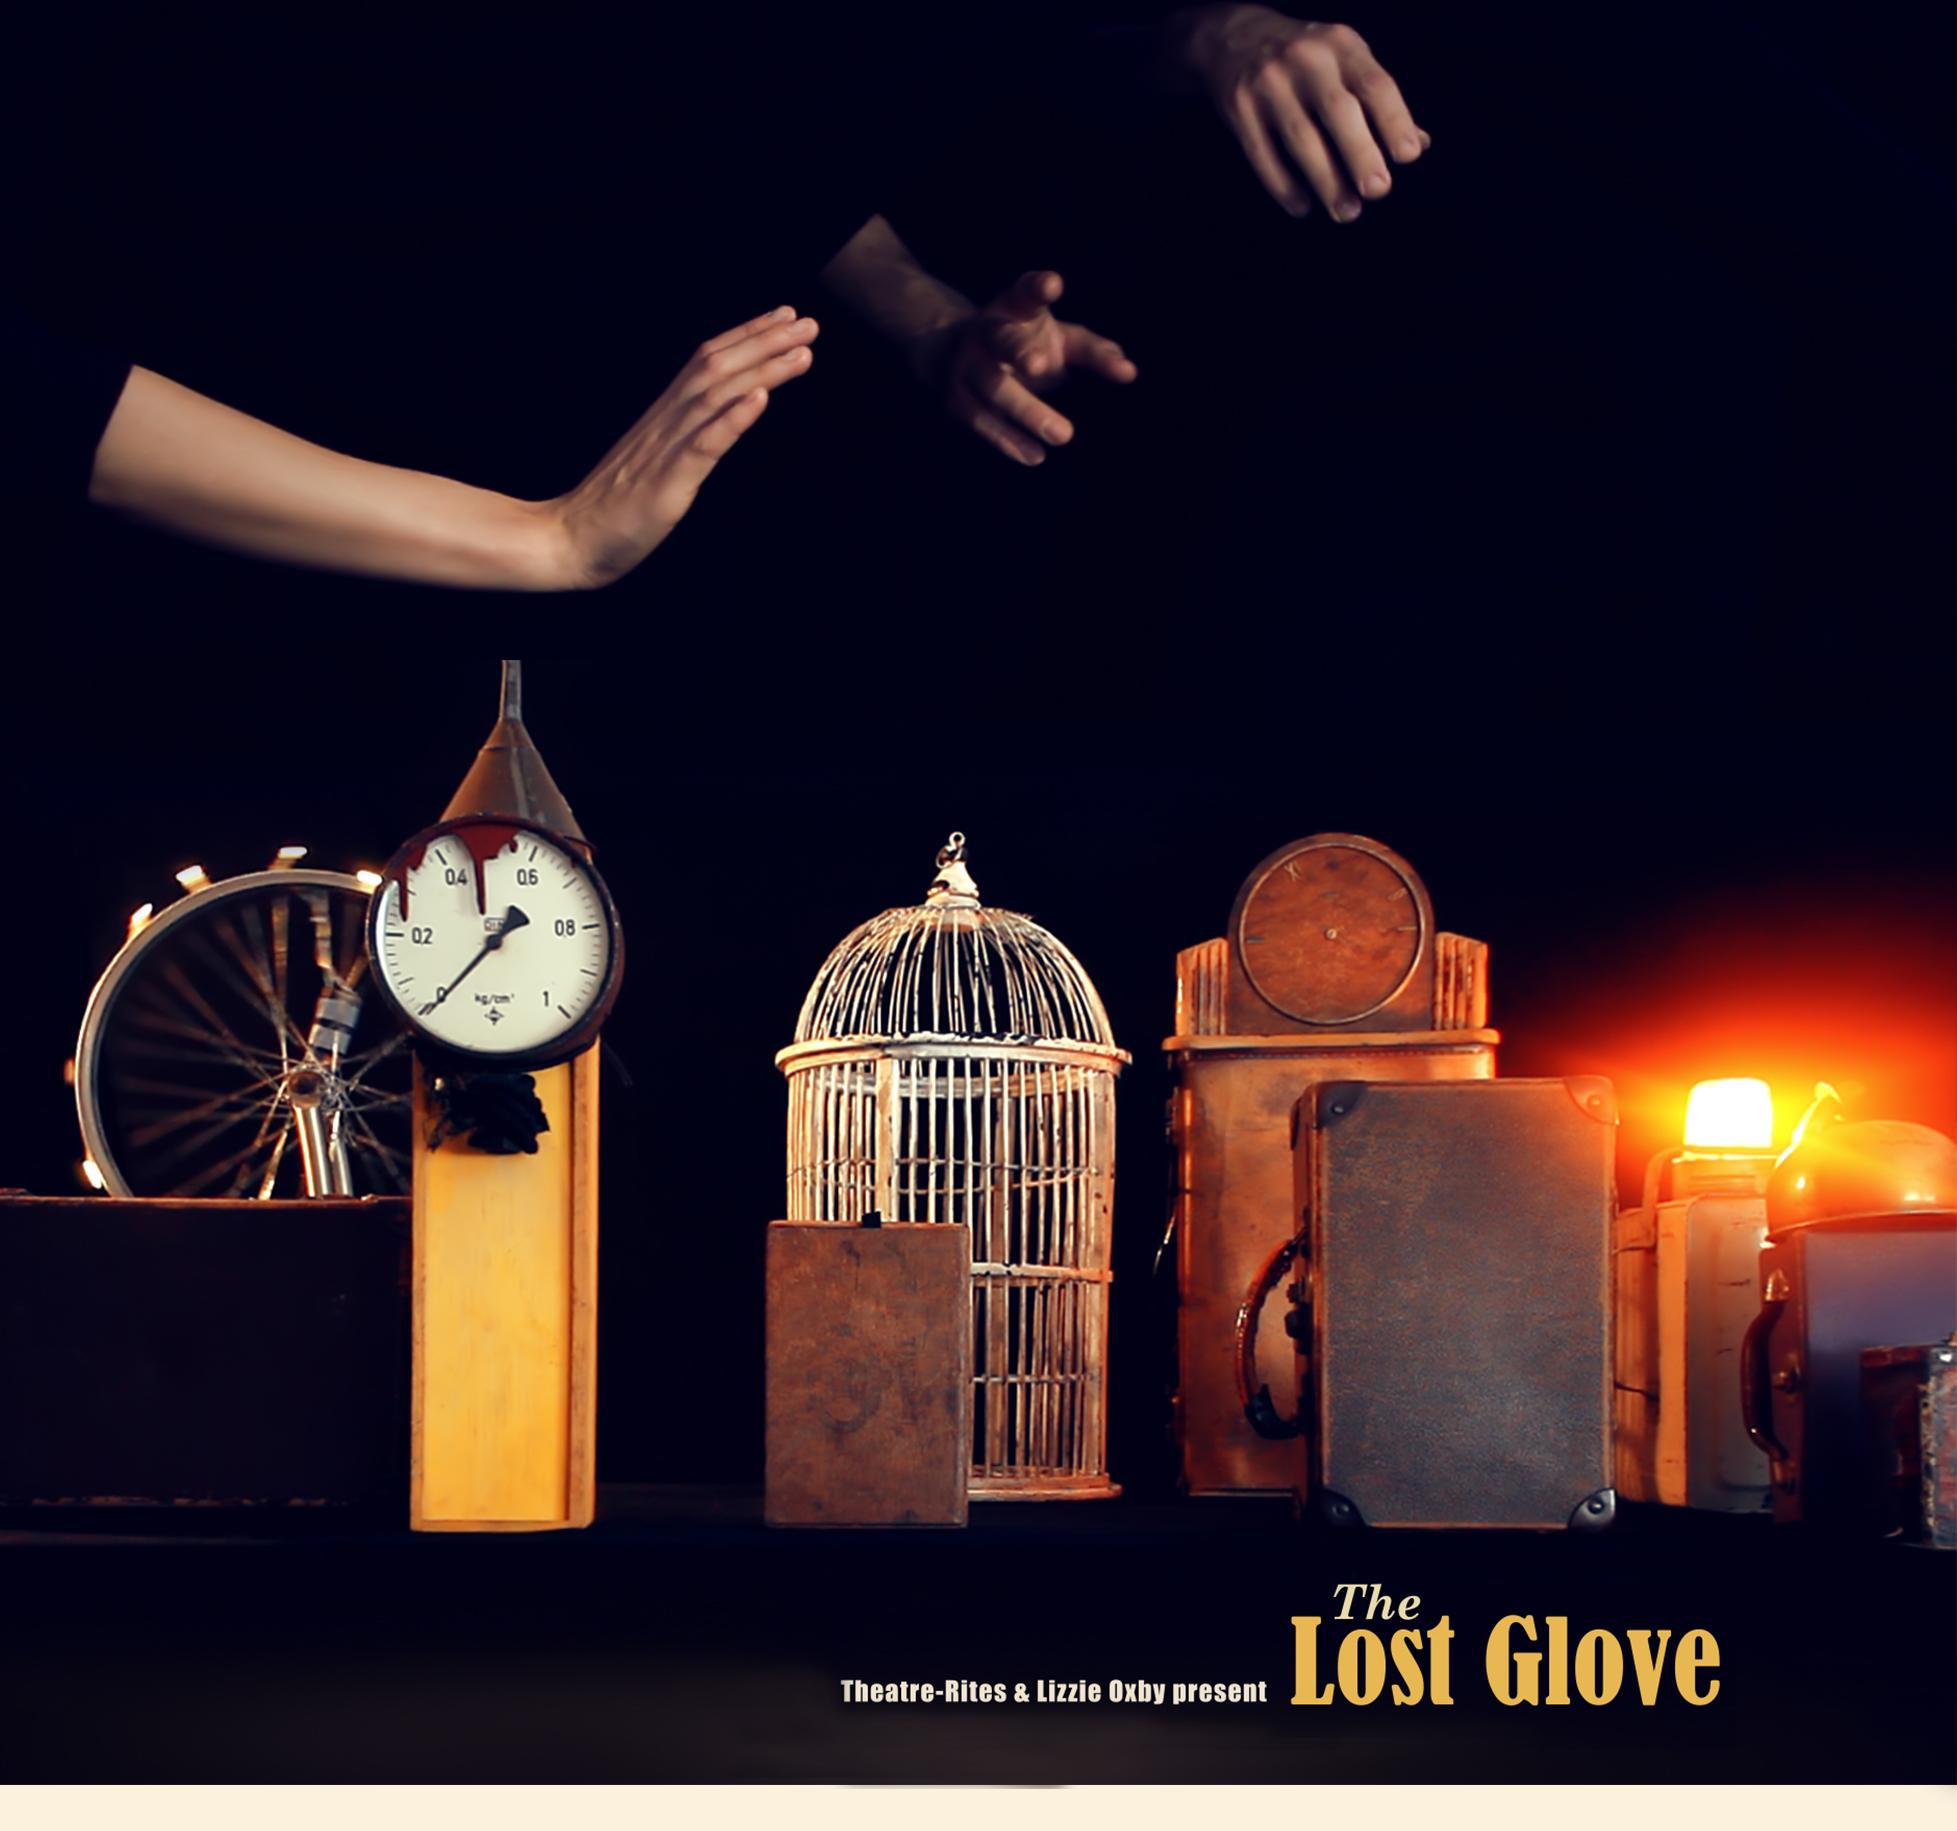 The Lost Glove -